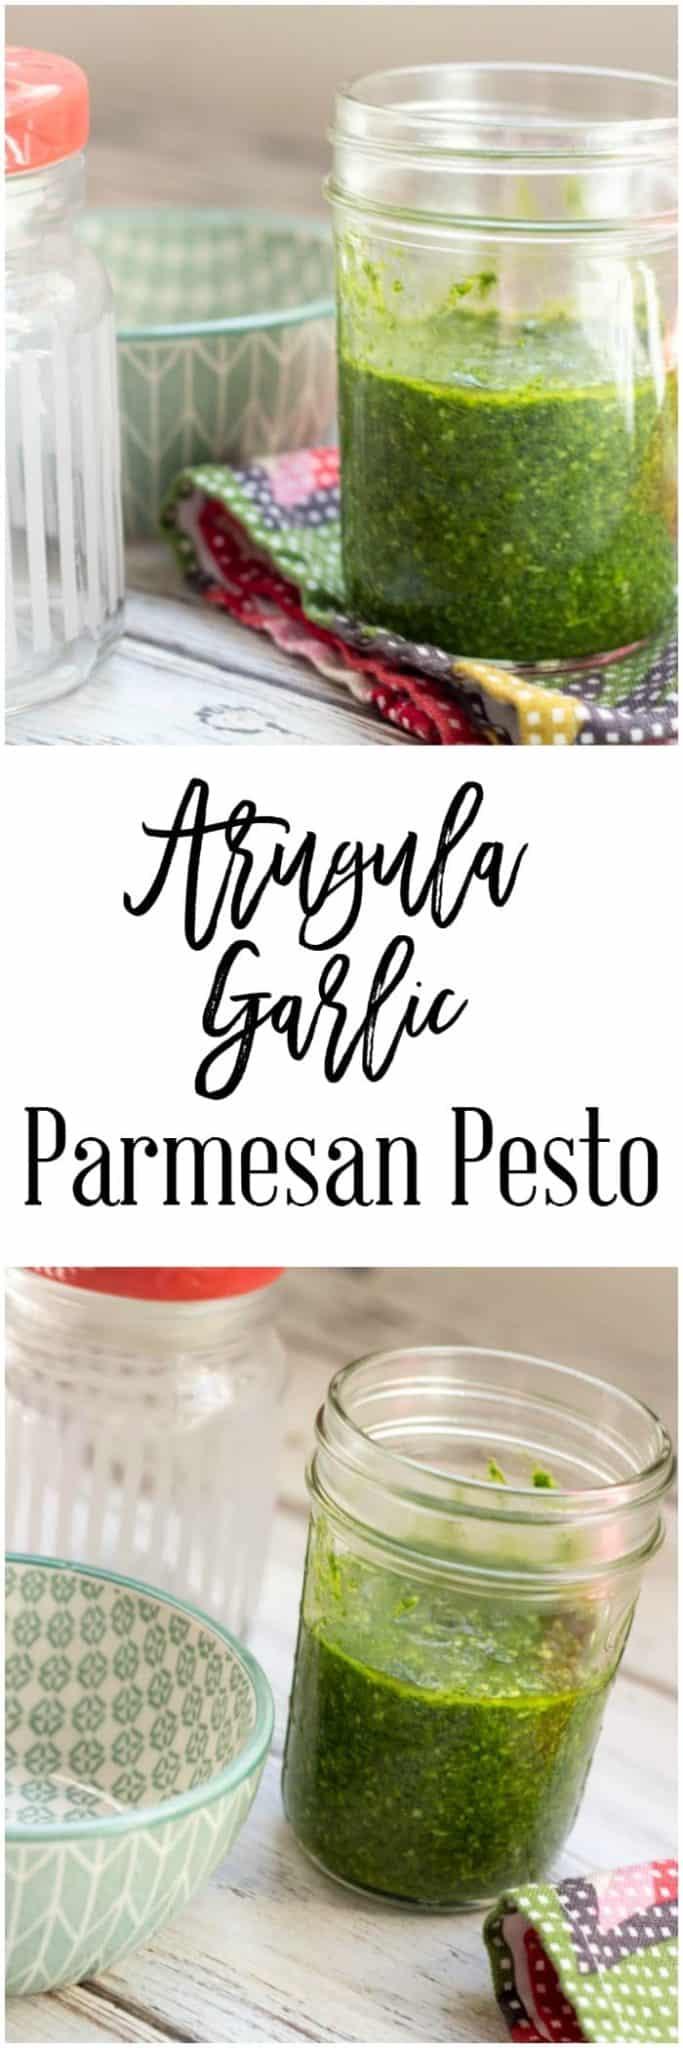 Arugula Garlic Parmesan Pesto